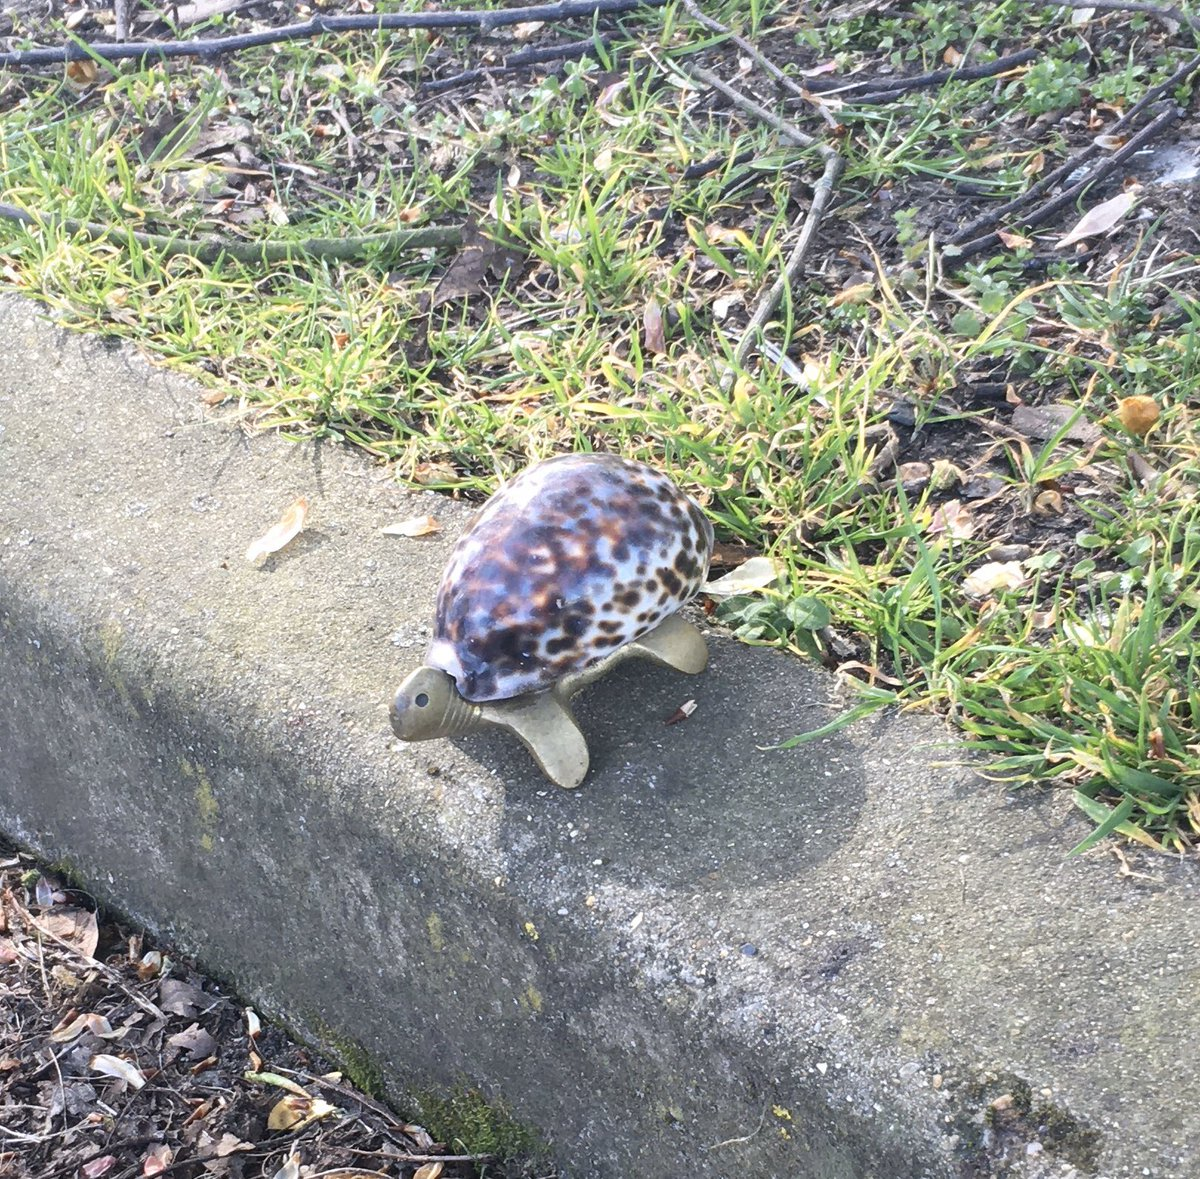 RT @SainiLiina: Tortoises are starting to come back to Crystal Palace Park. Nature is healing etc etc. https://t.co/gPpwxaFNYo